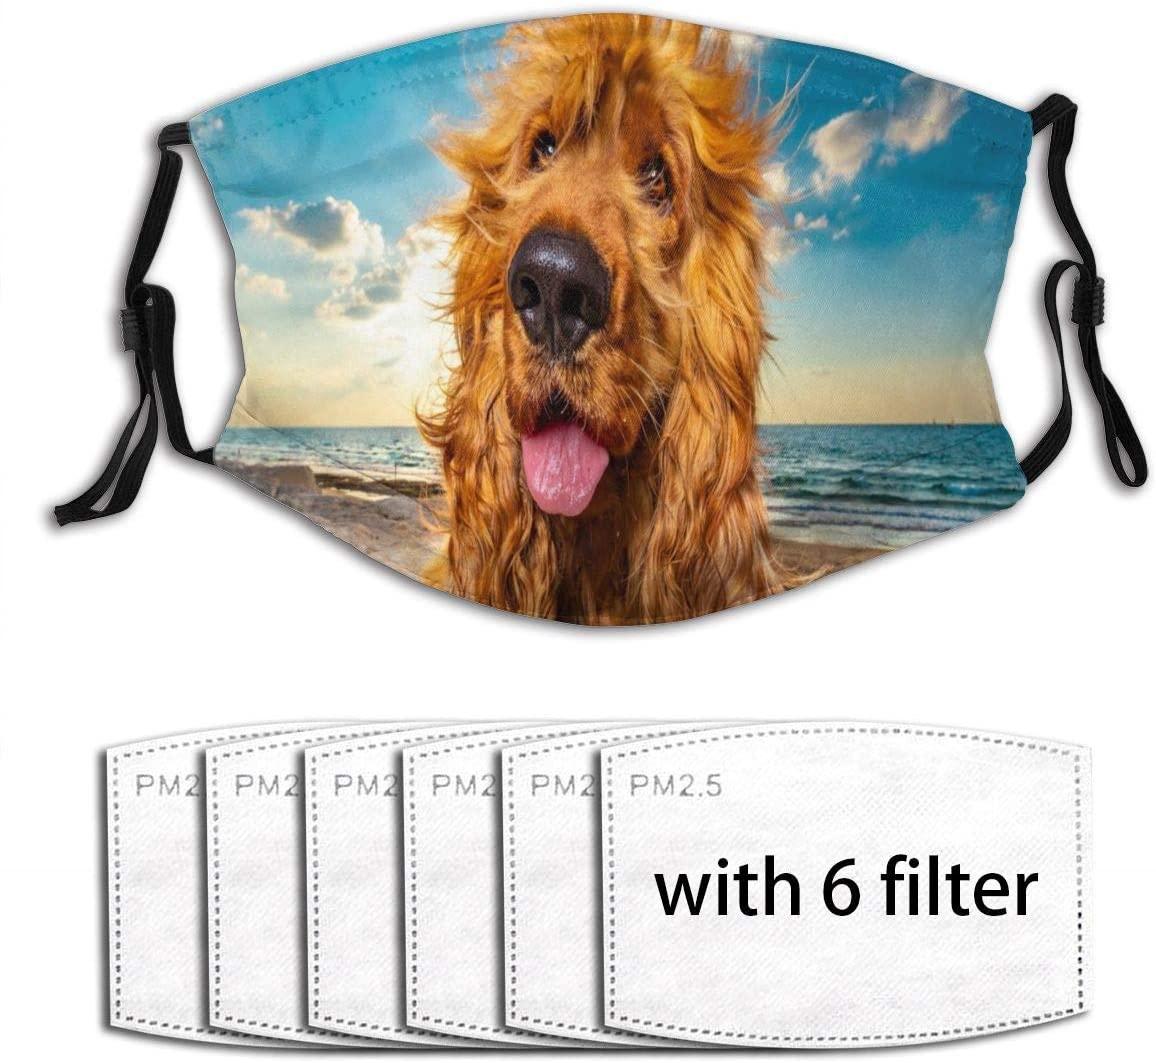 Ladninag Cute Funny Golden Retriever Dog Women's Men's Fashion Face Protective, Cloth Fabric Cotton Cover Protection, Unisex Bandana Balaclava with Fillter Dust, Washable, Reusable